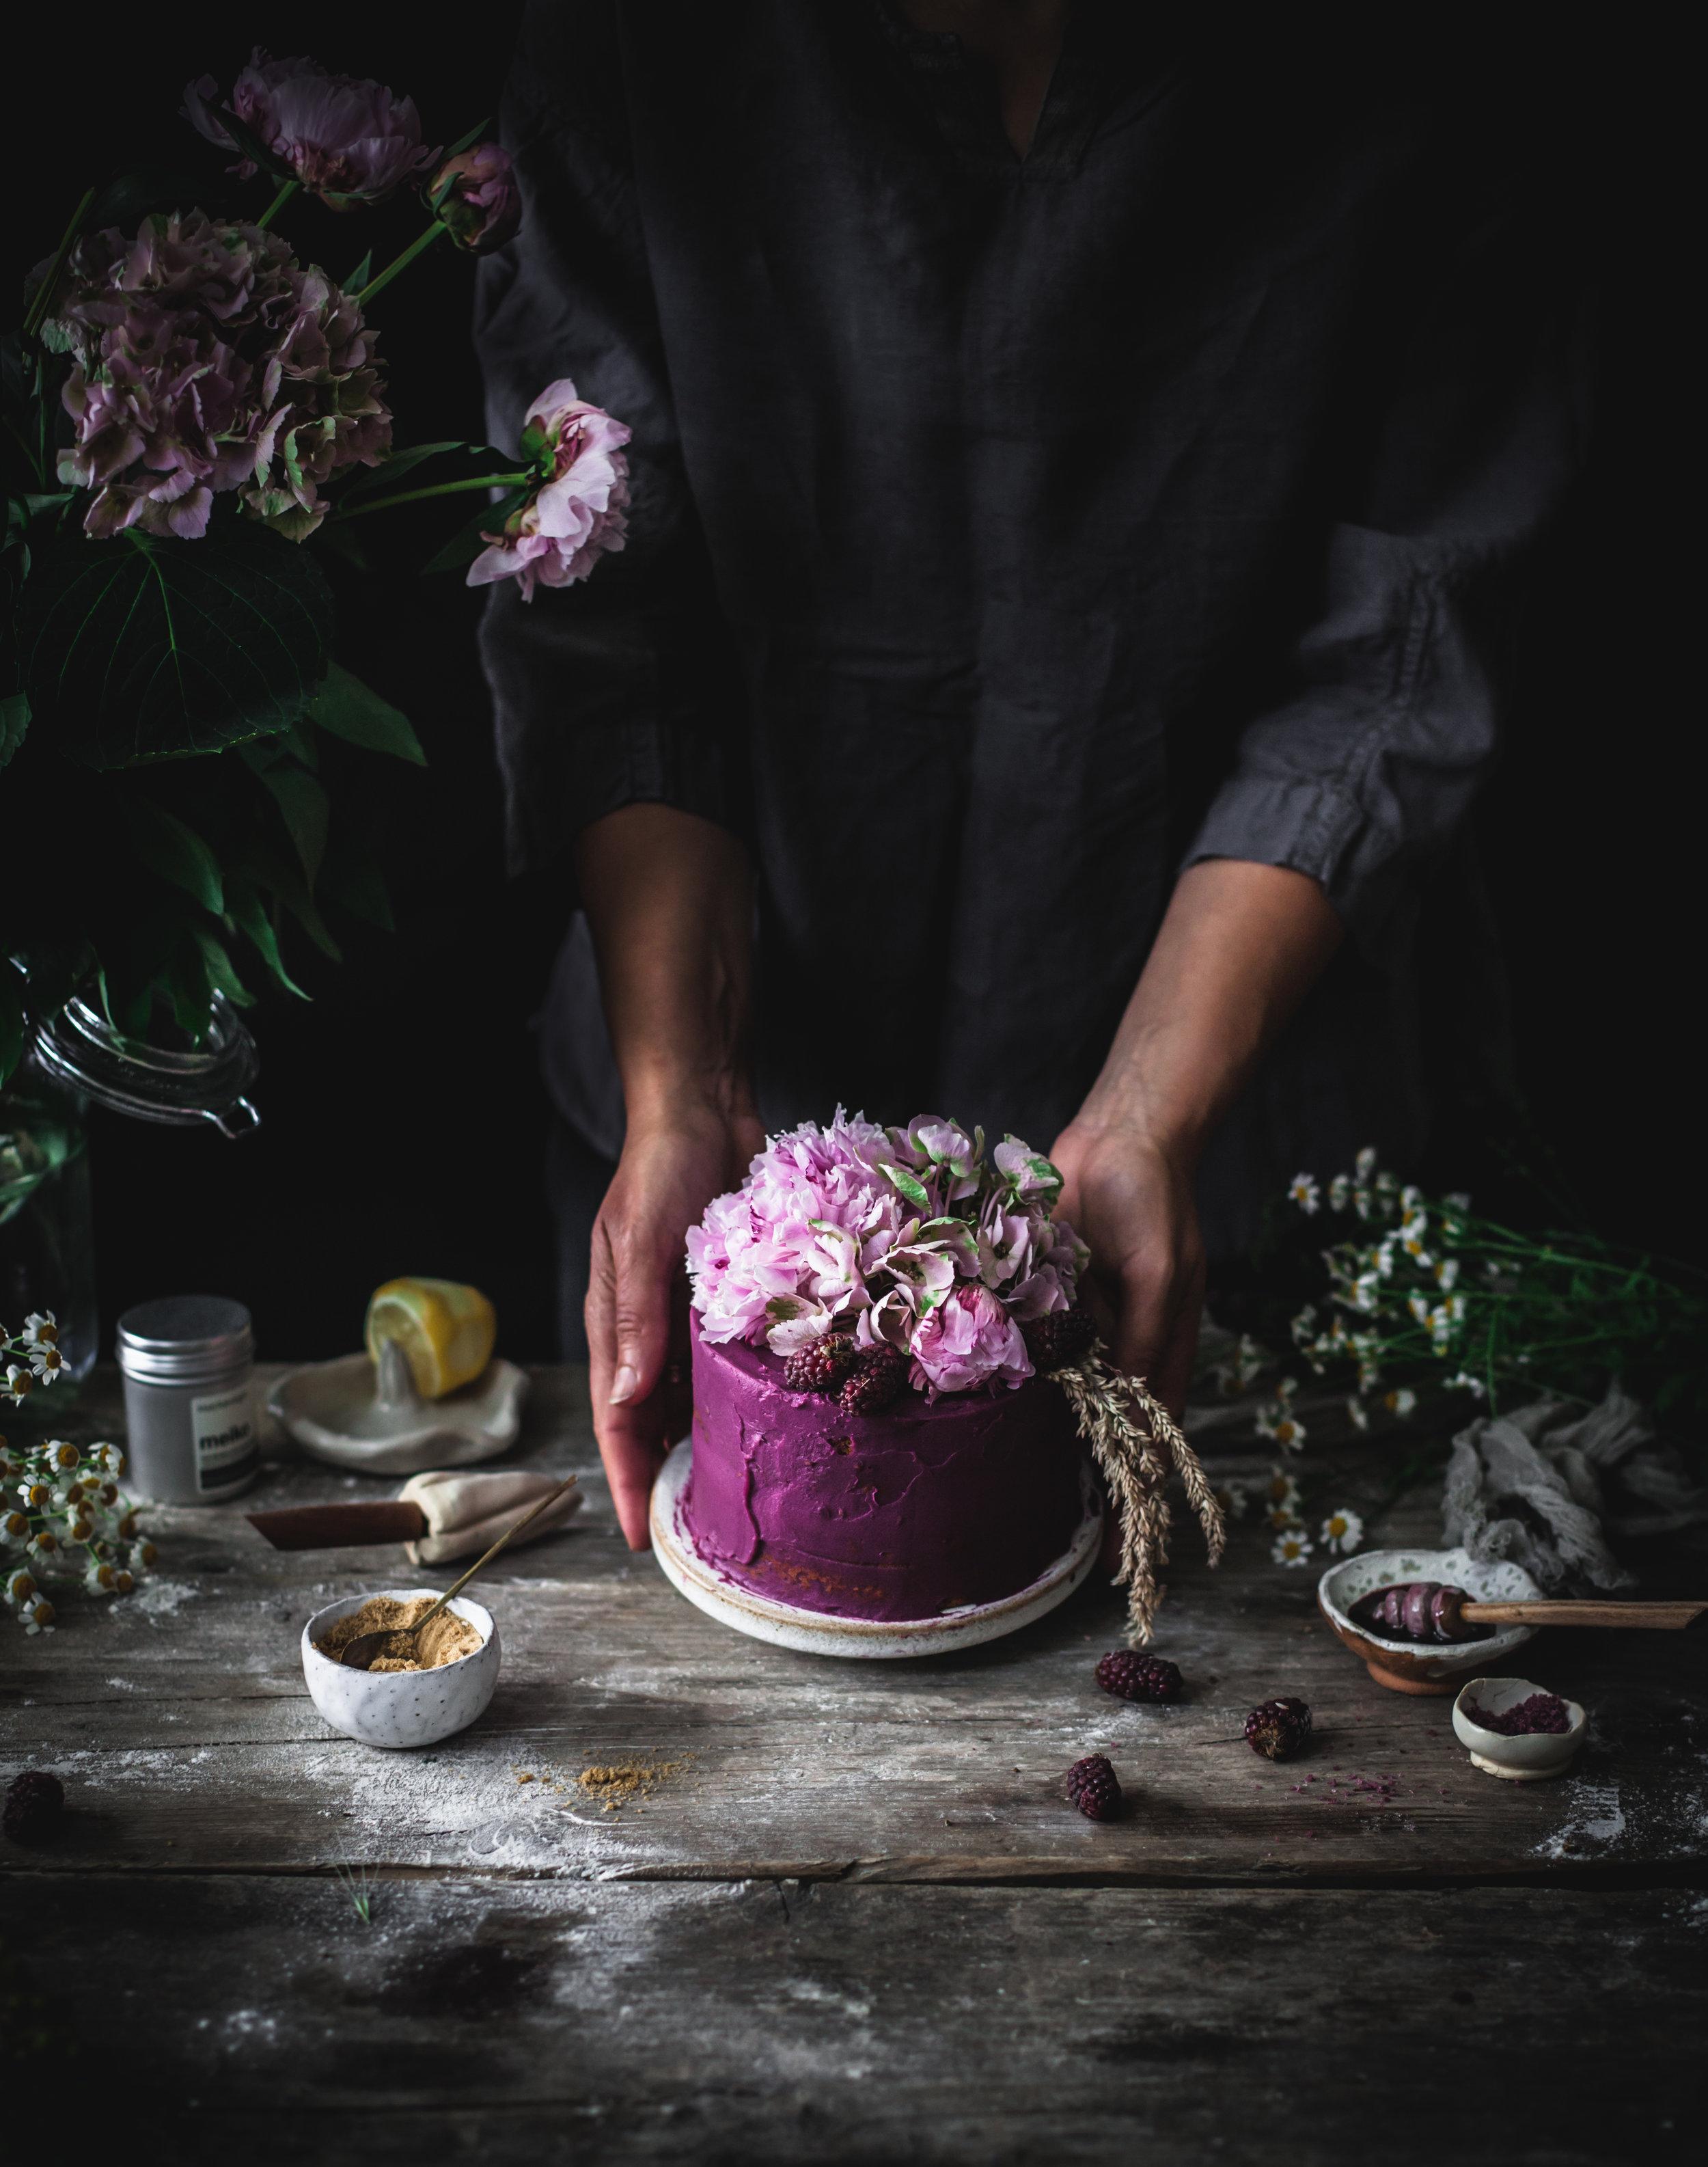 purple potatoes & white chocolate cake